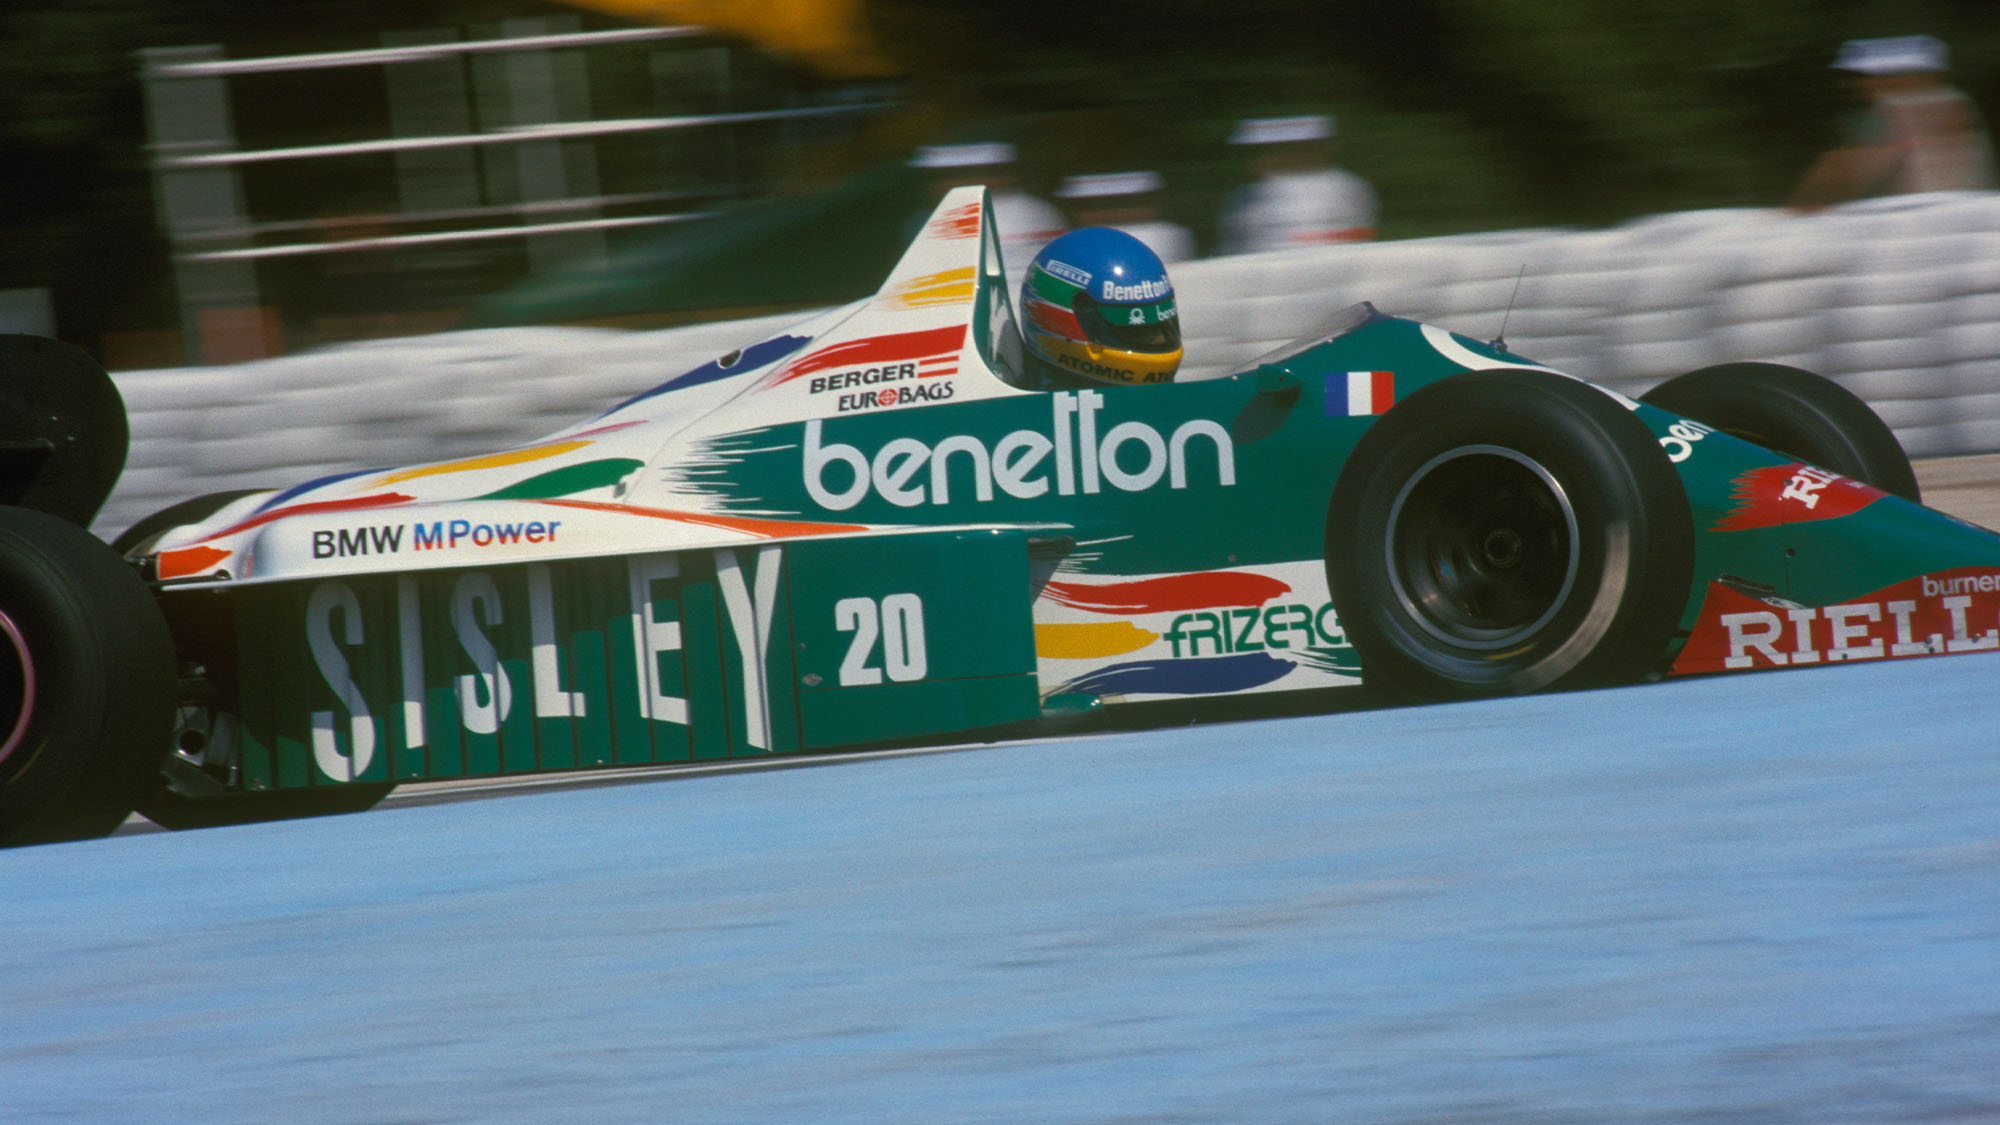 Gerhard Berger Benetton 1986 1